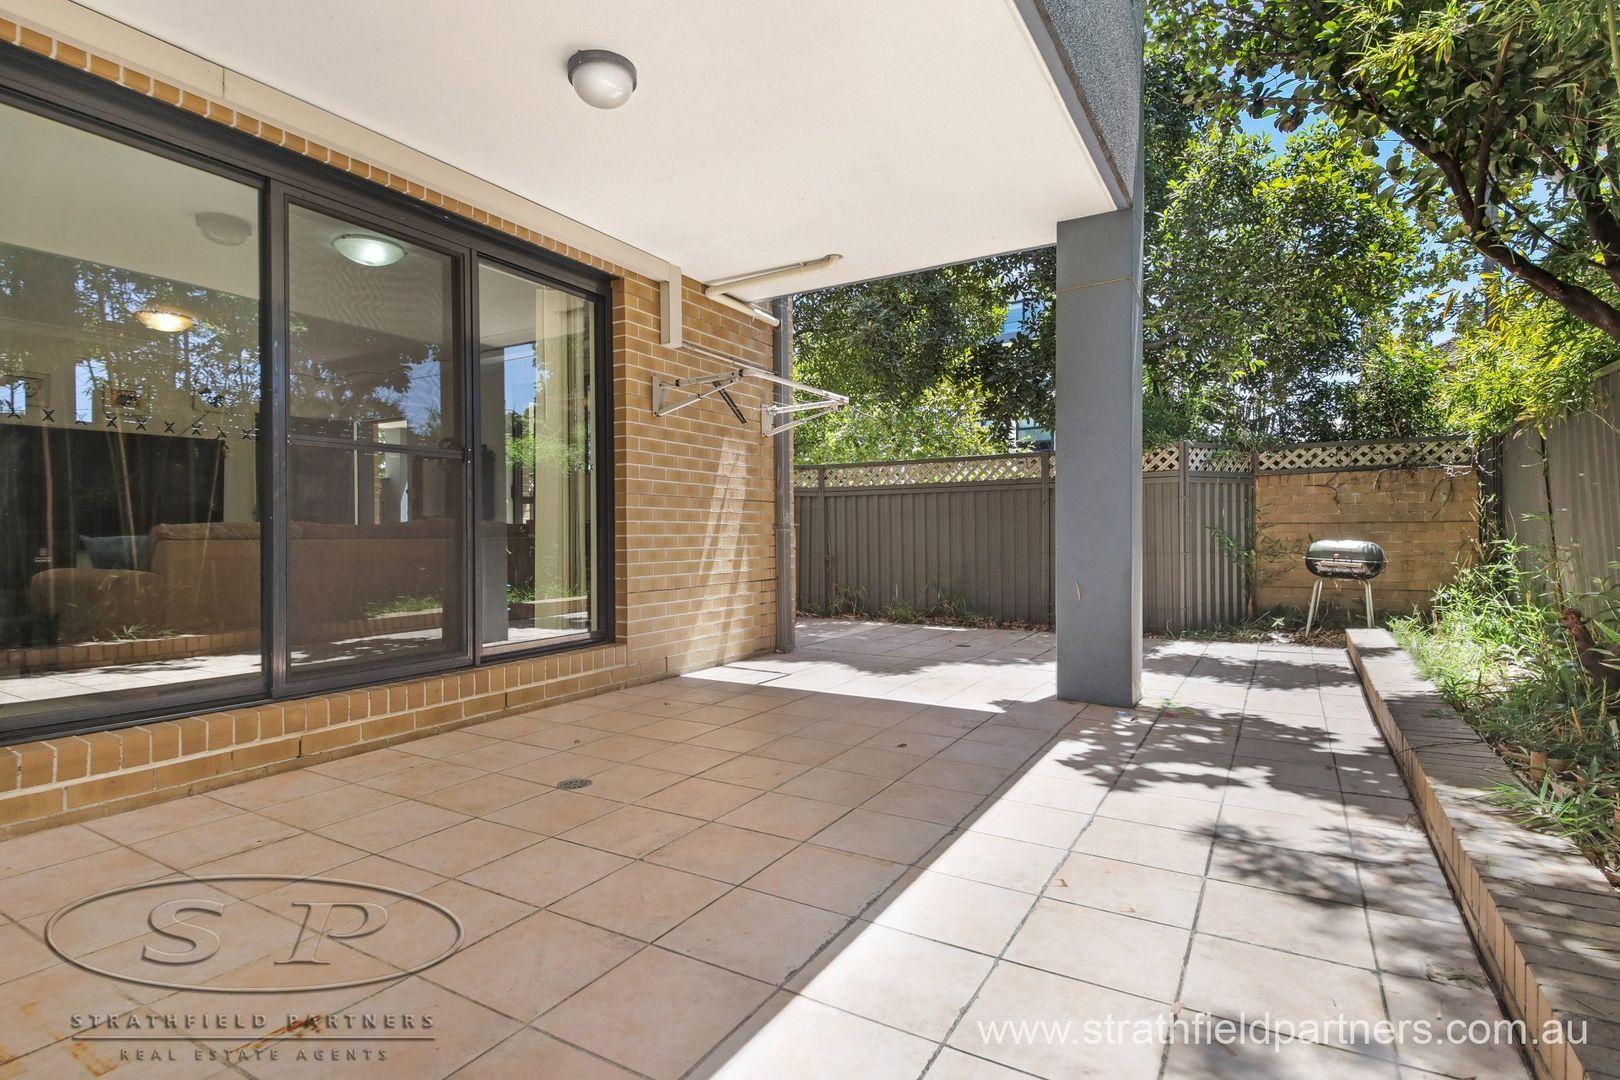 1/9 Anselm Street, Strathfield South NSW 2136, Image 2